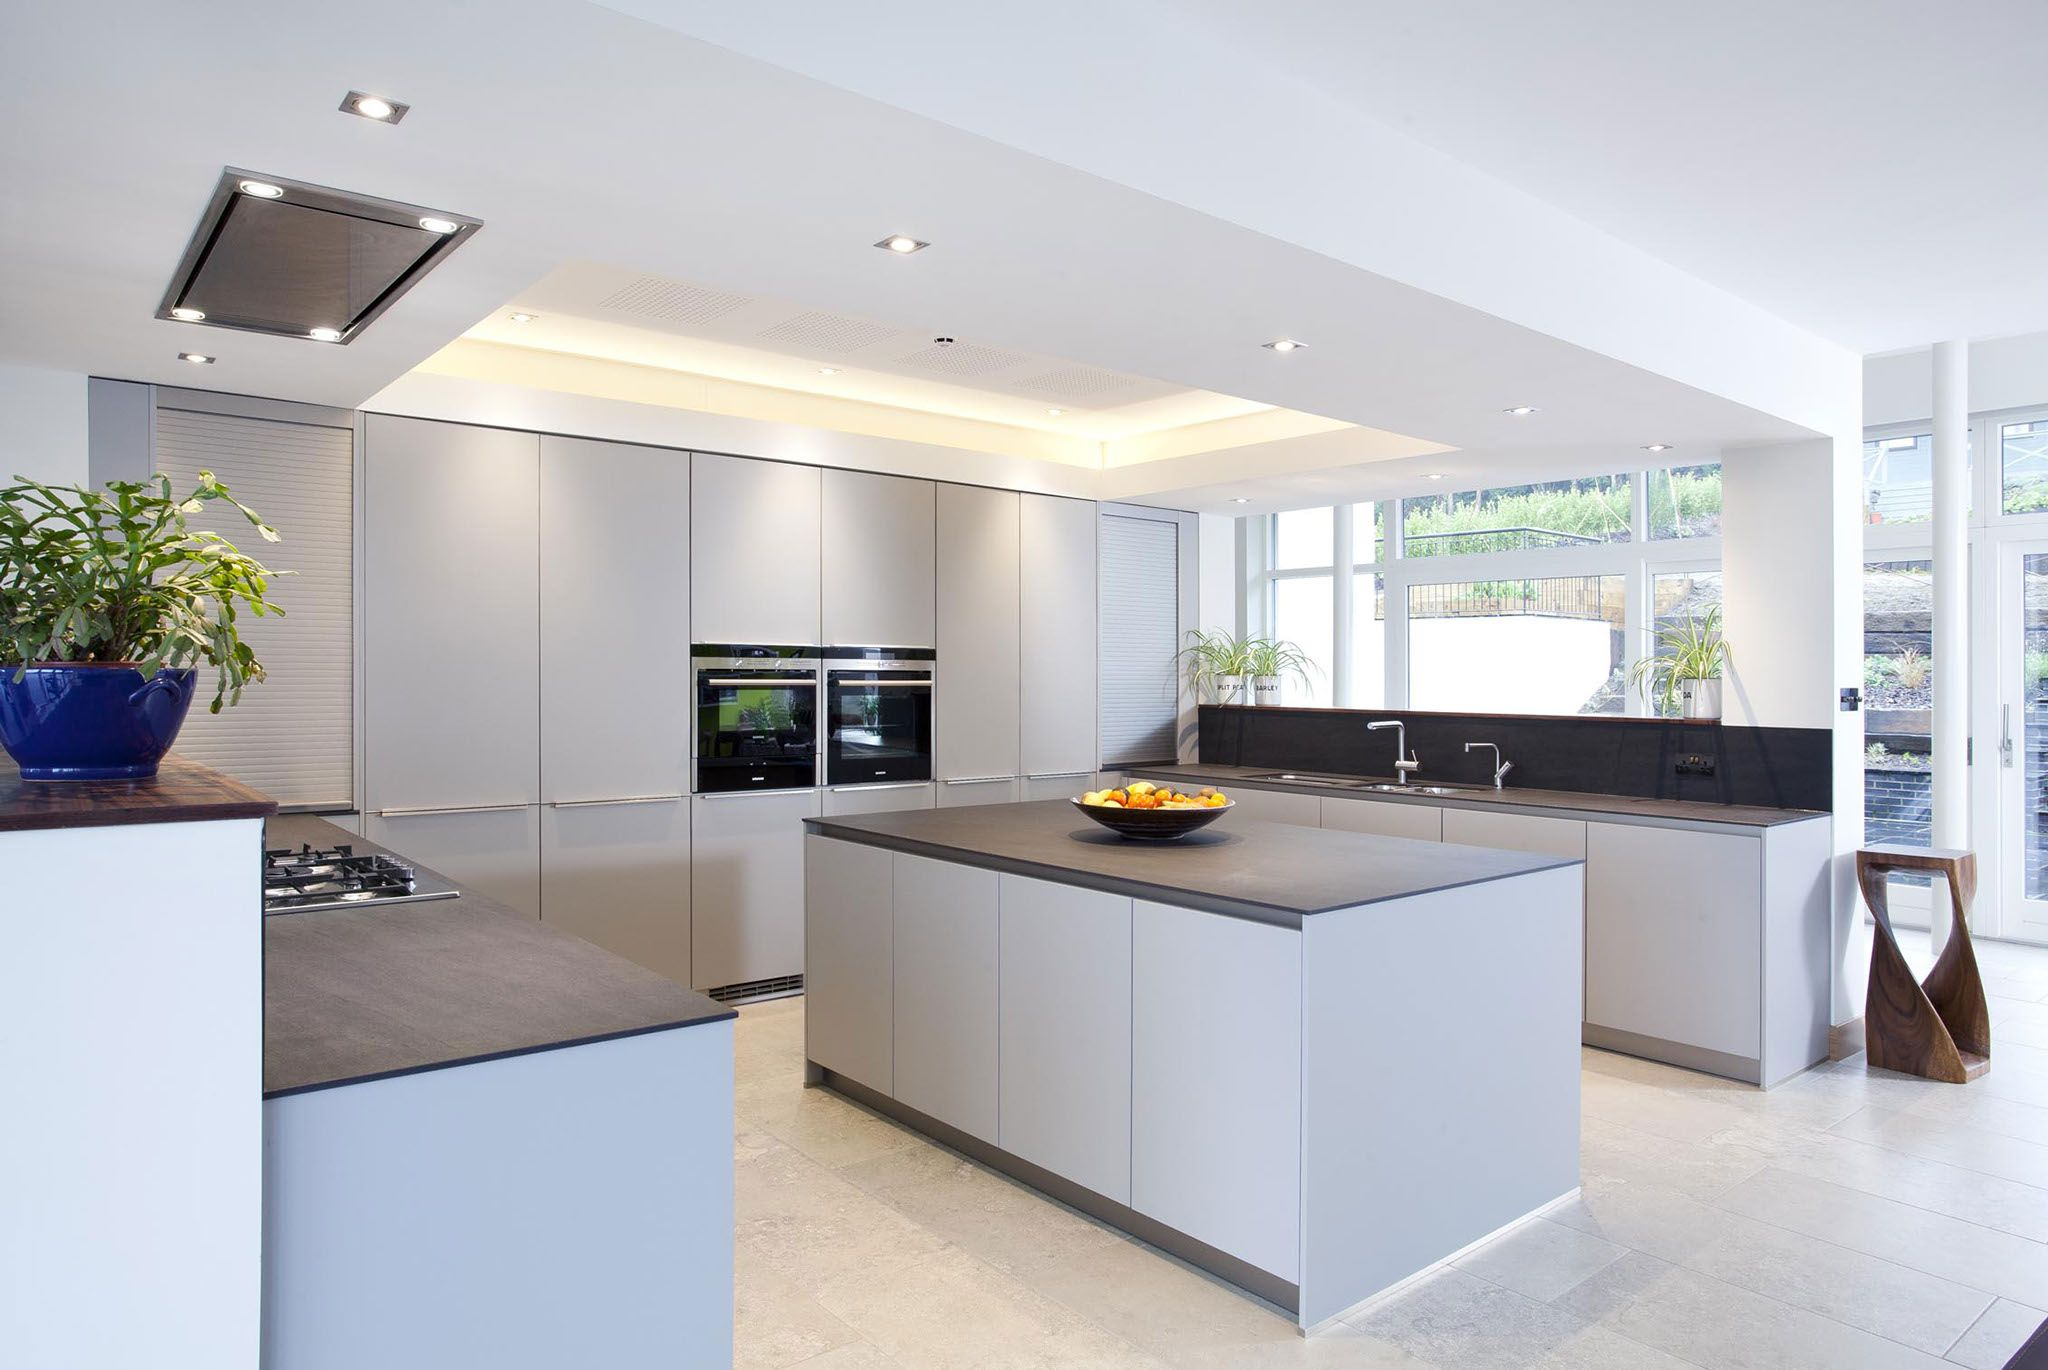 Ballymenoch Holywood Matt Grey German Design This Contemporary Inspiration Modern German Kitchen Designs Design Ideas